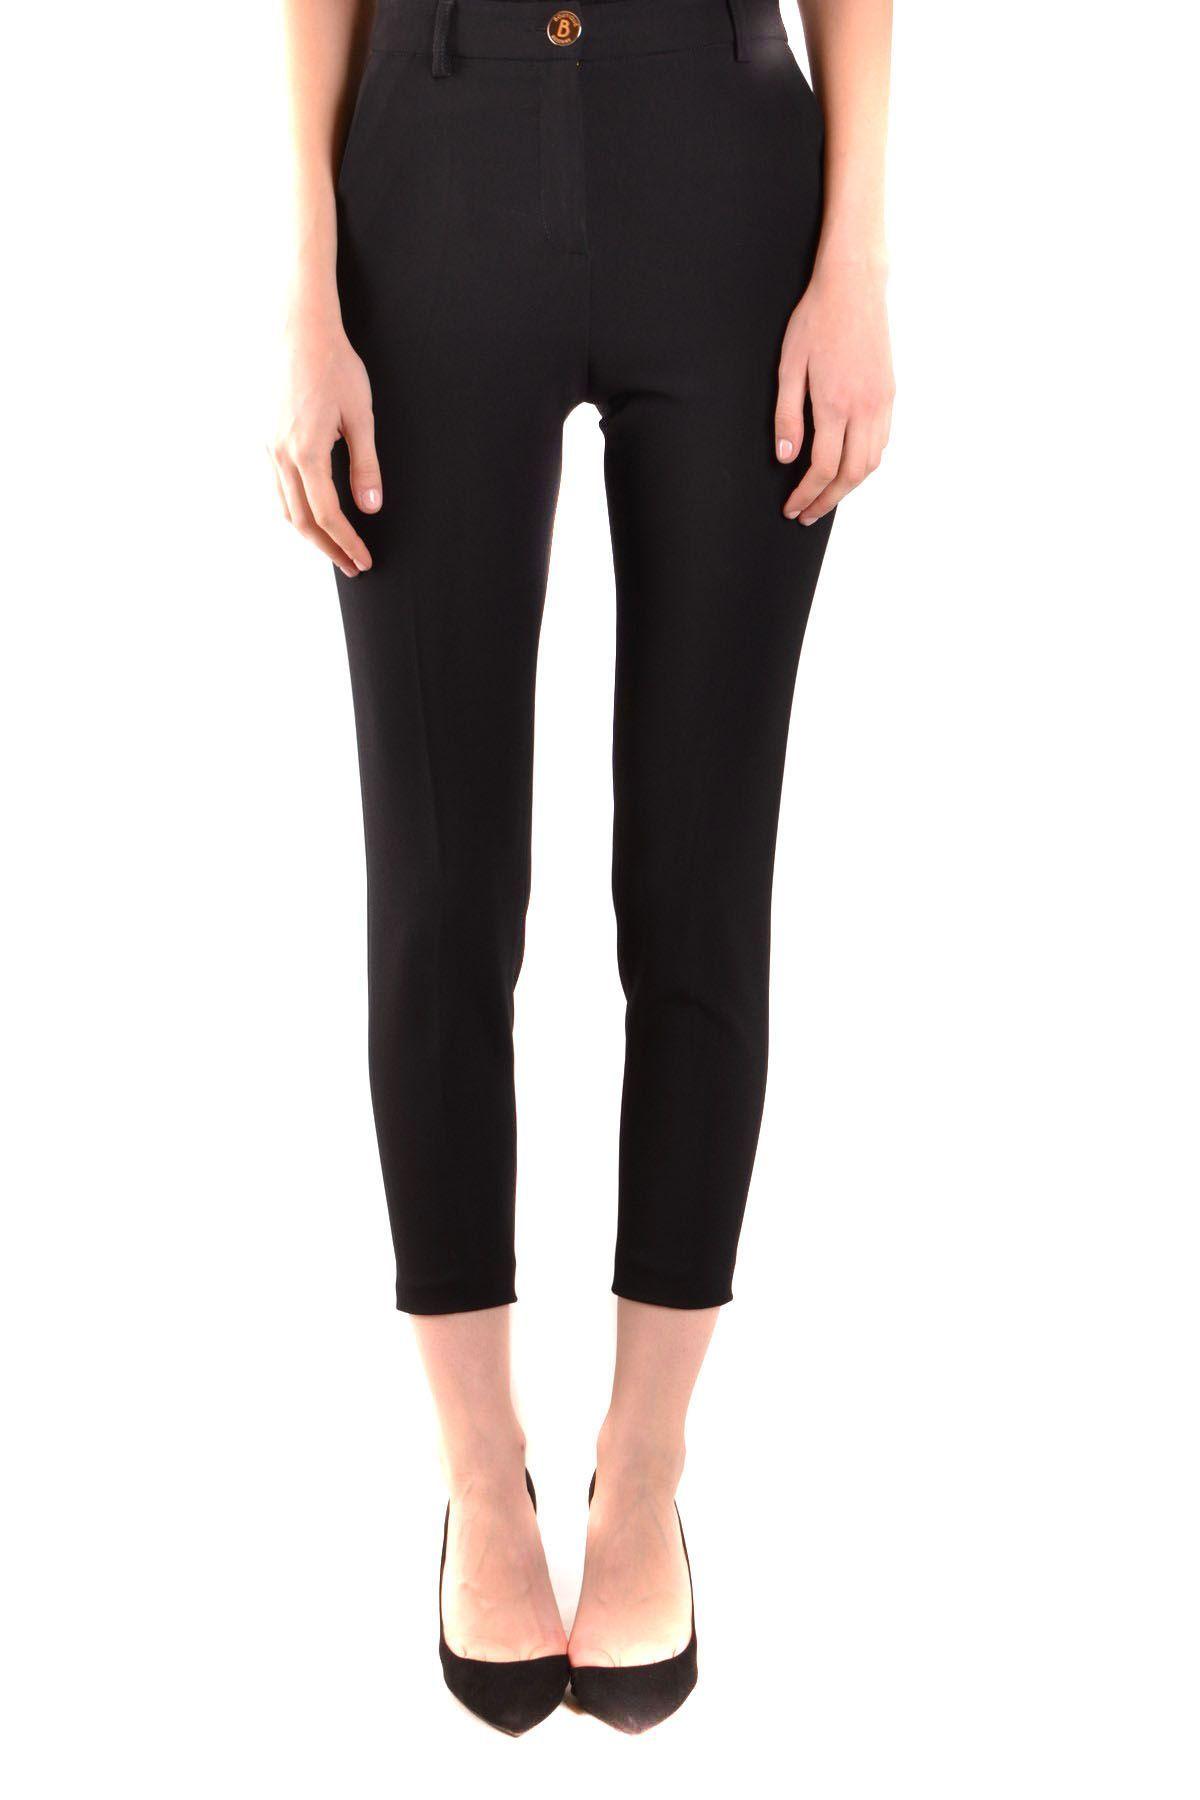 BOUTIQUE MOSCHINO WOMEN'S A03111124555 BLACK SILK PANTS